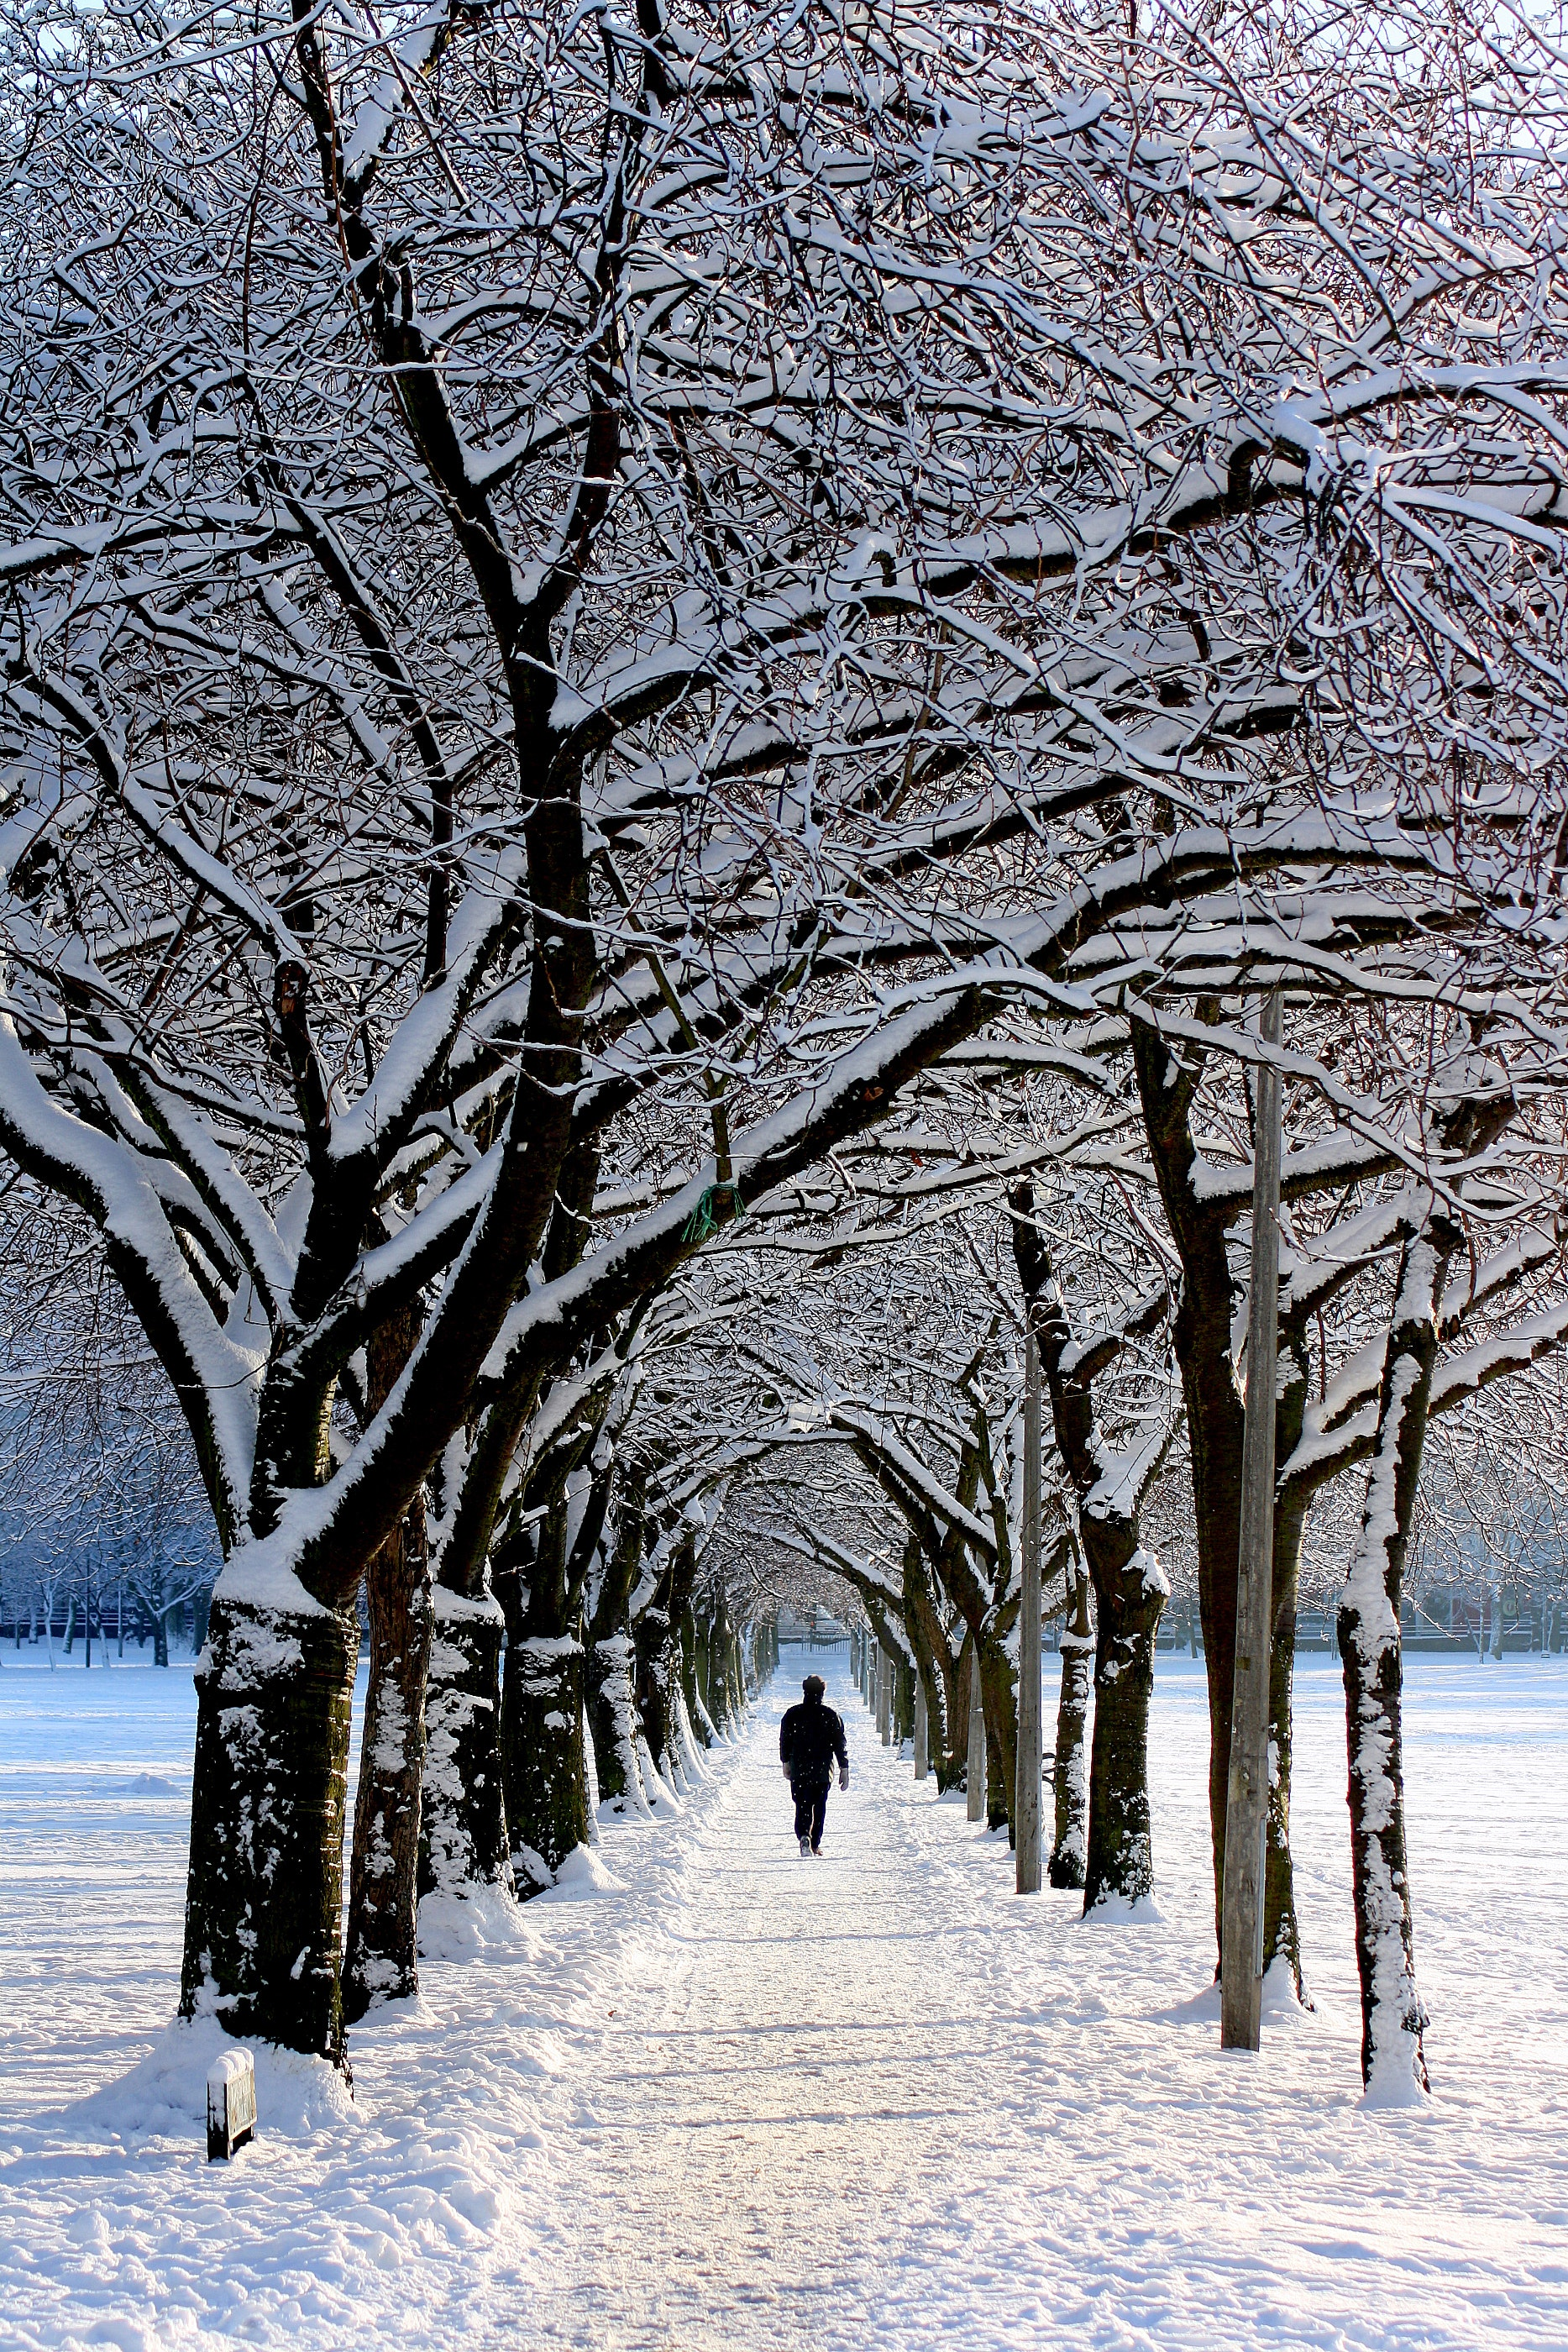 Man in black jacket walking on snowy tree during daytime photo